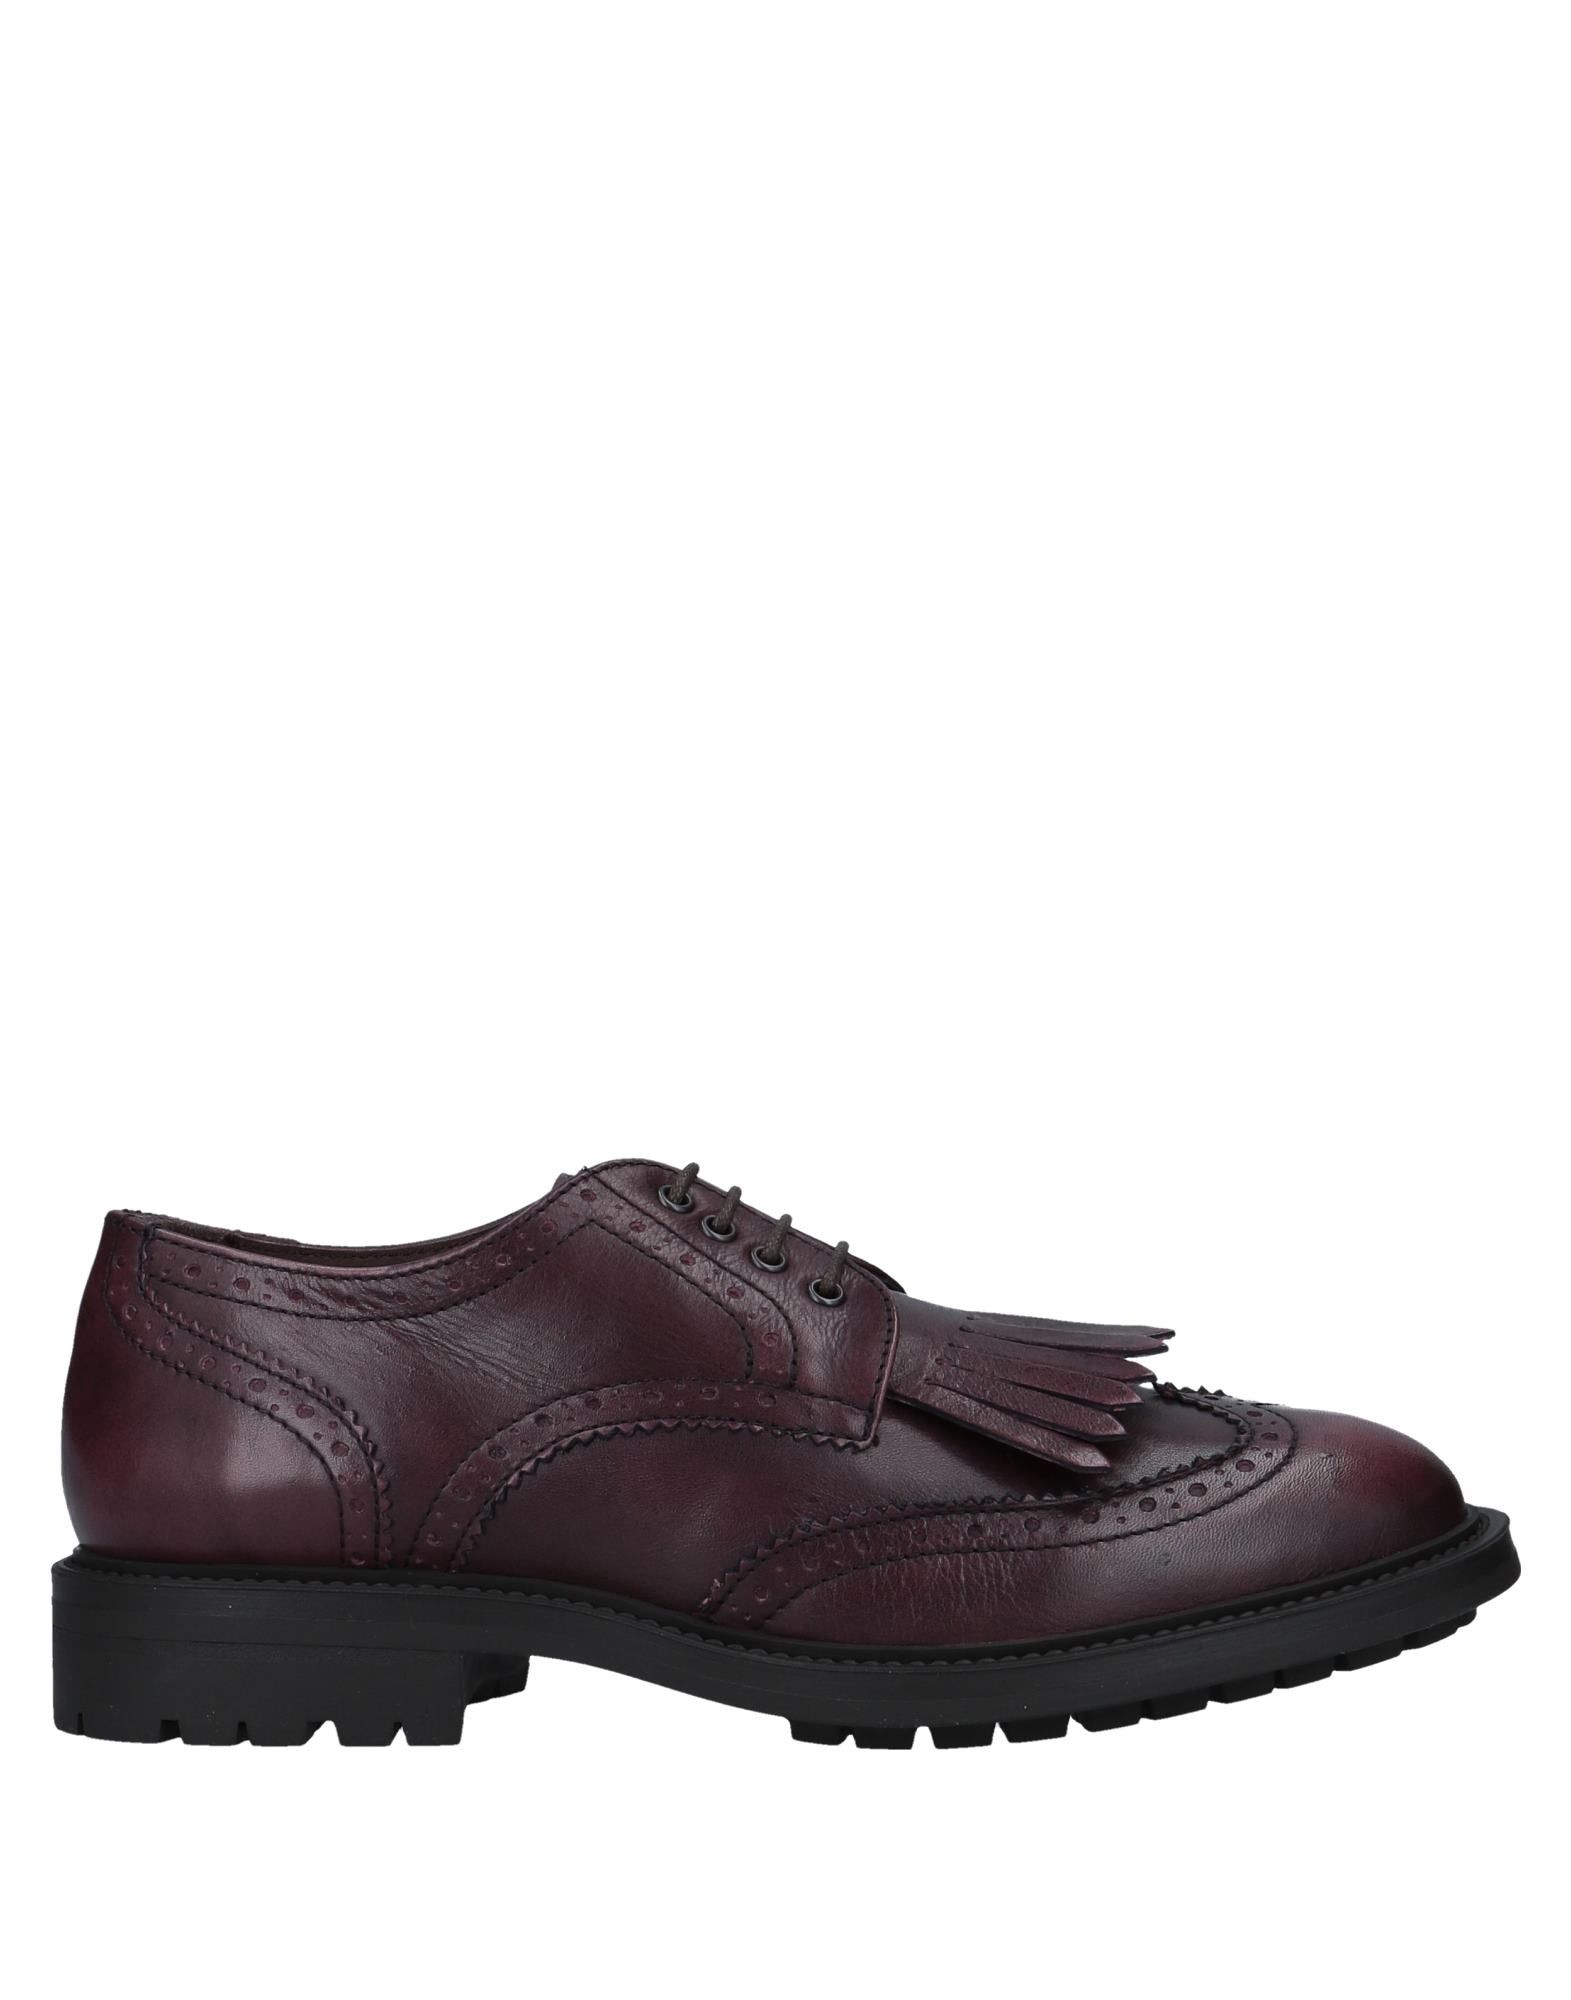 Boemos Schnürschuhe Damen  11549750AS Gute Qualität beliebte Schuhe